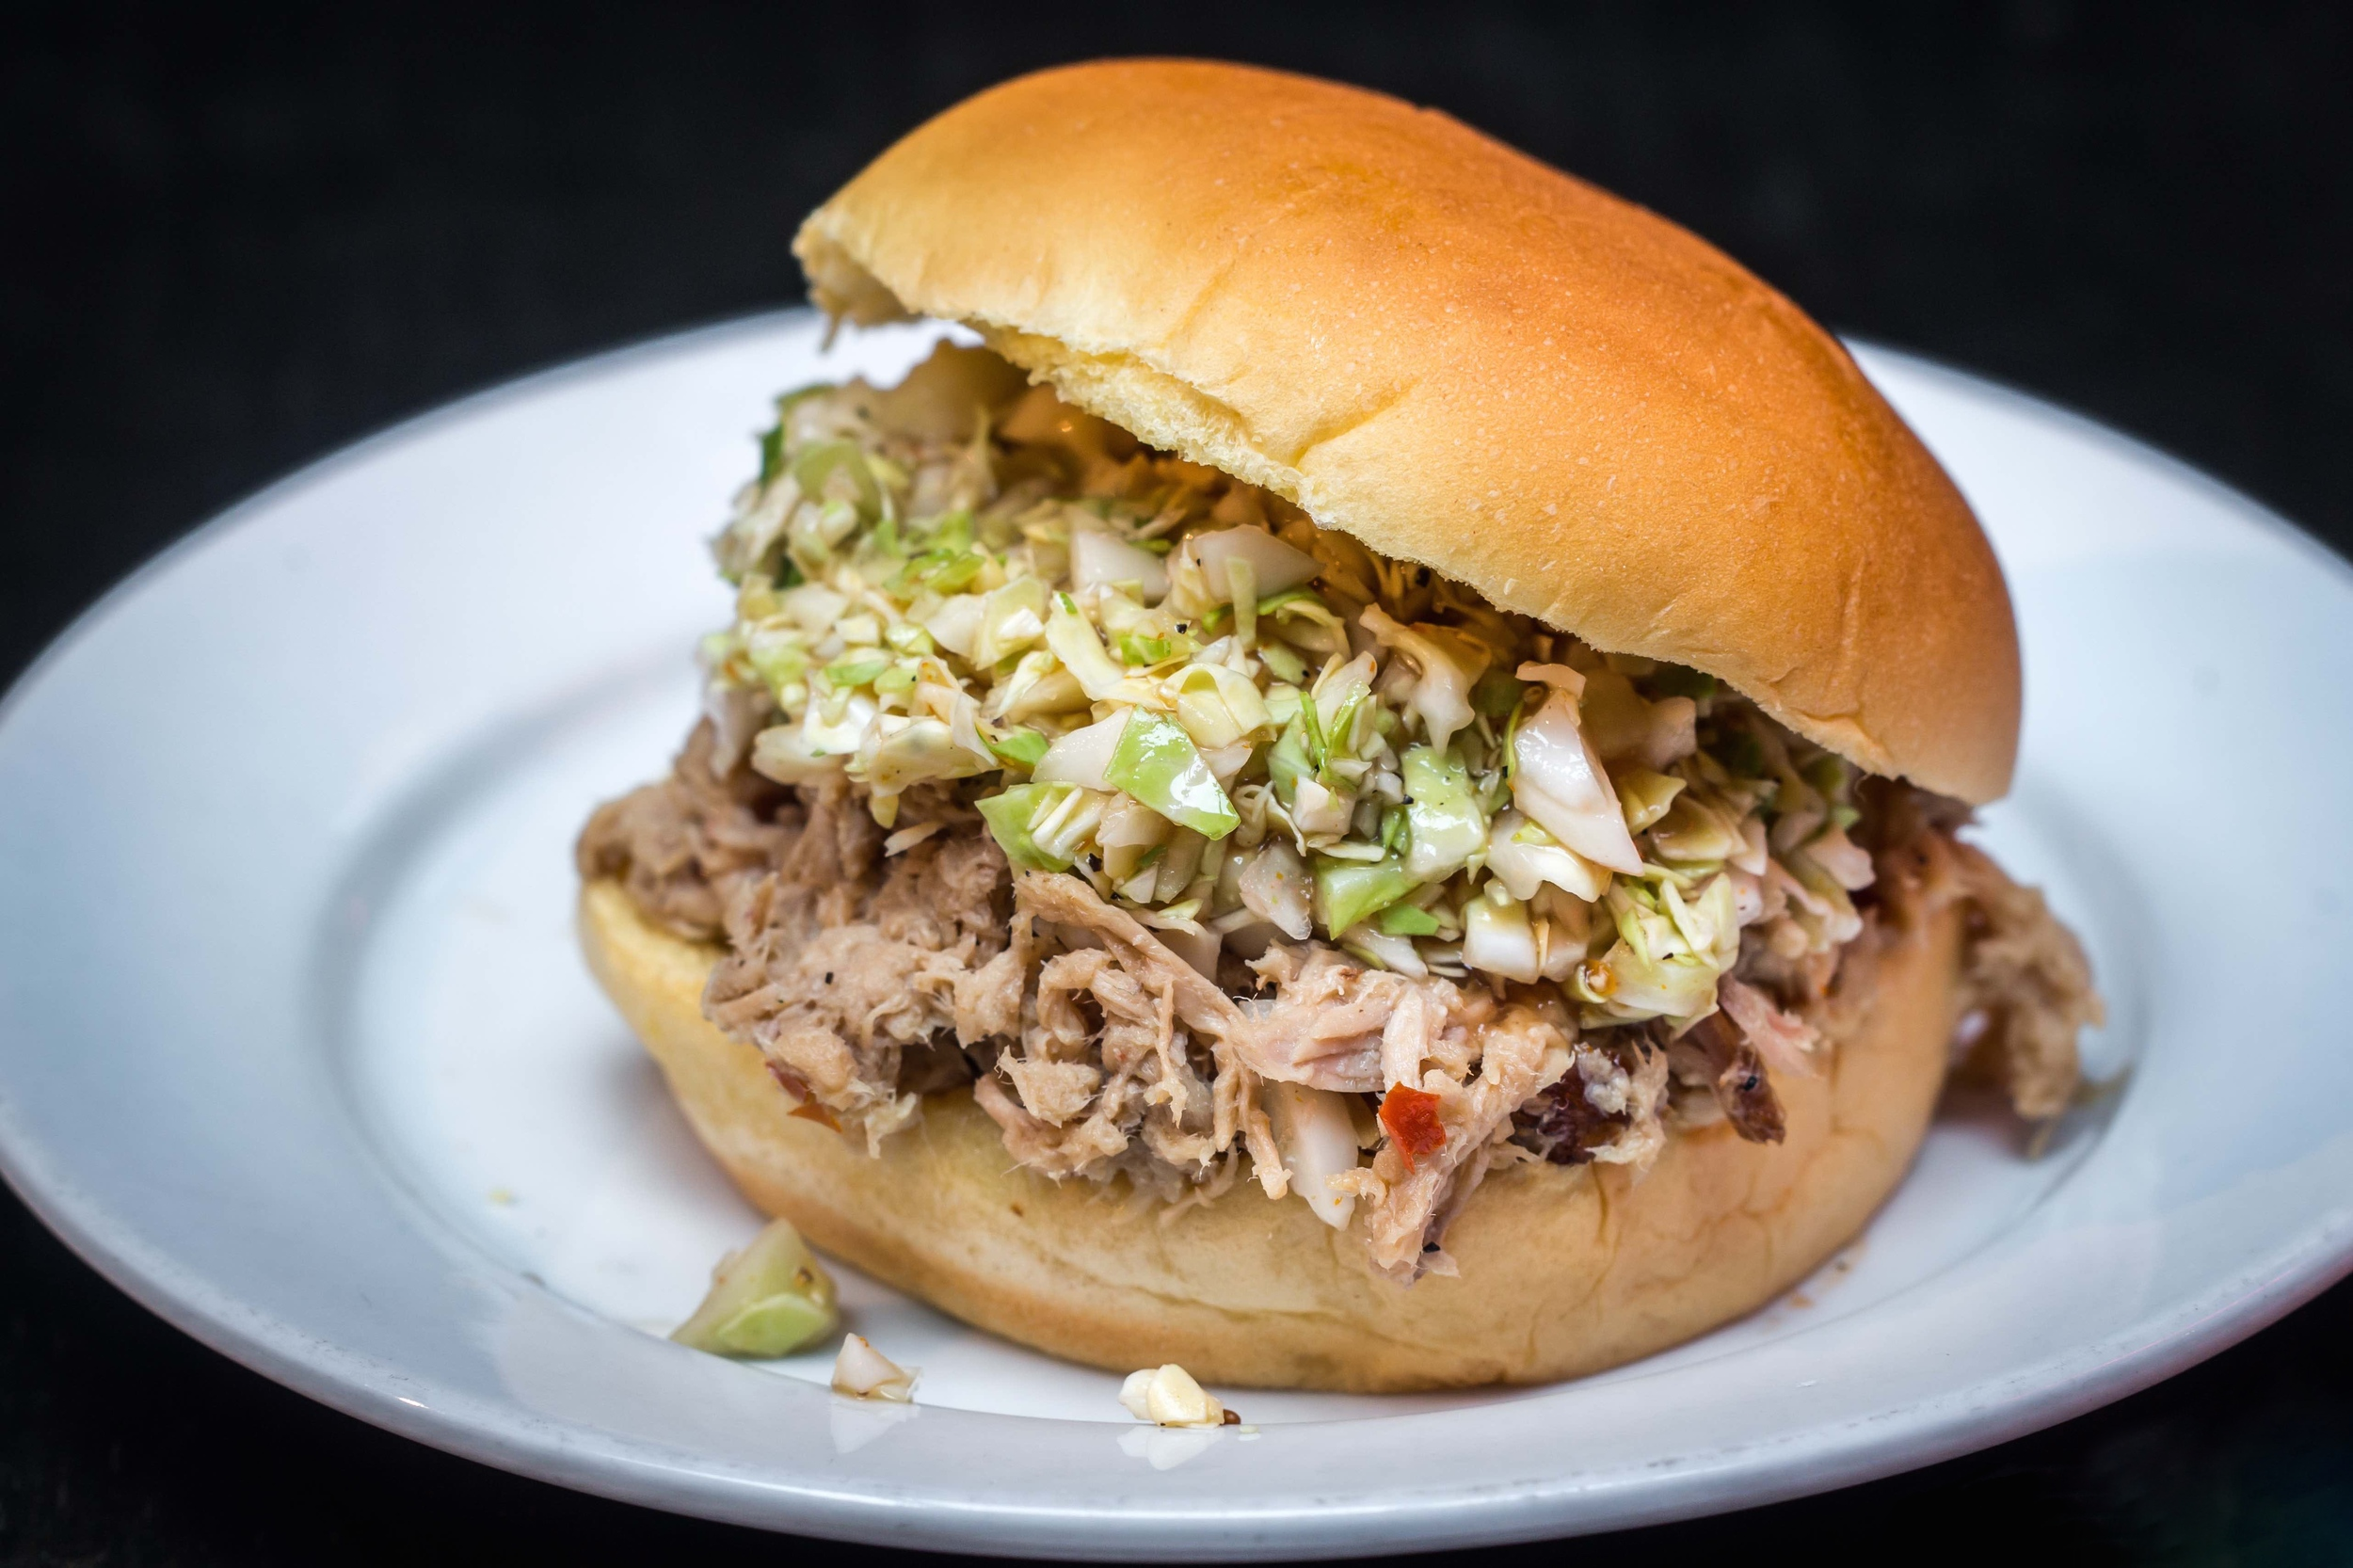 North Carolina Pulled Pork Sandwich